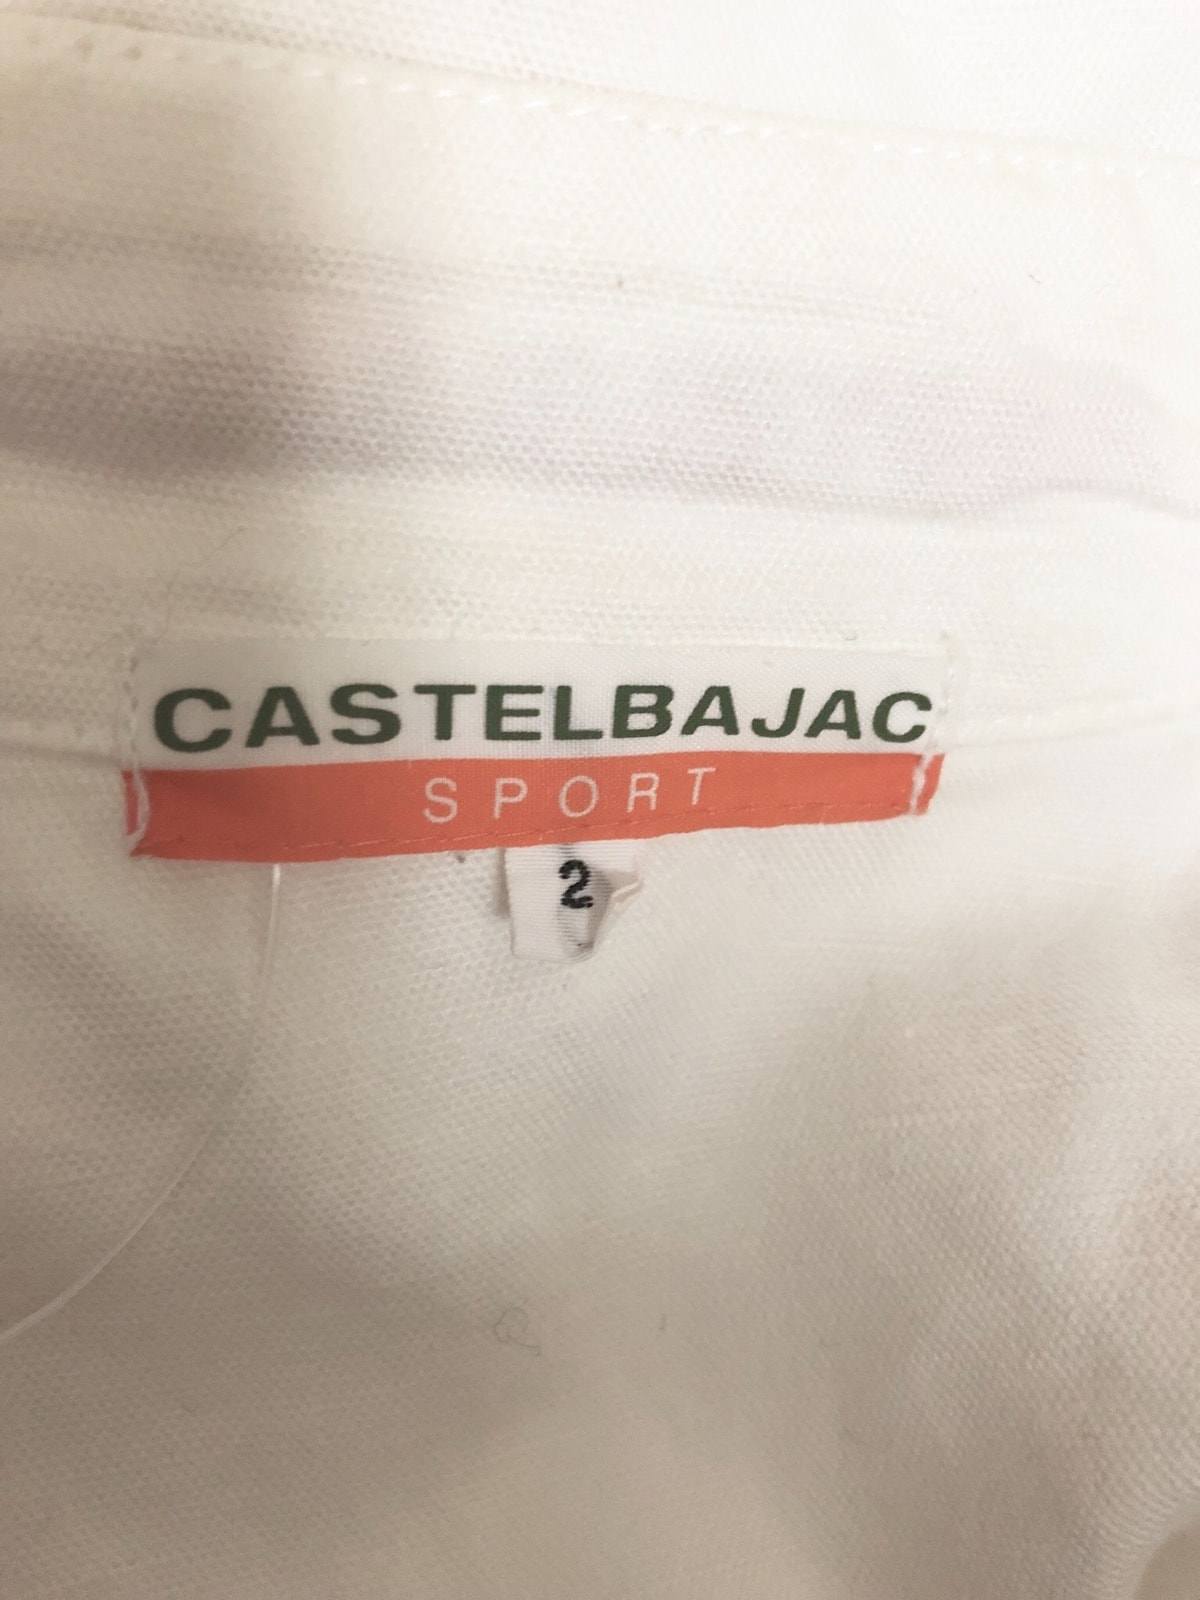 CastelbajacSport(カステルバジャックスポーツ)のブルゾン